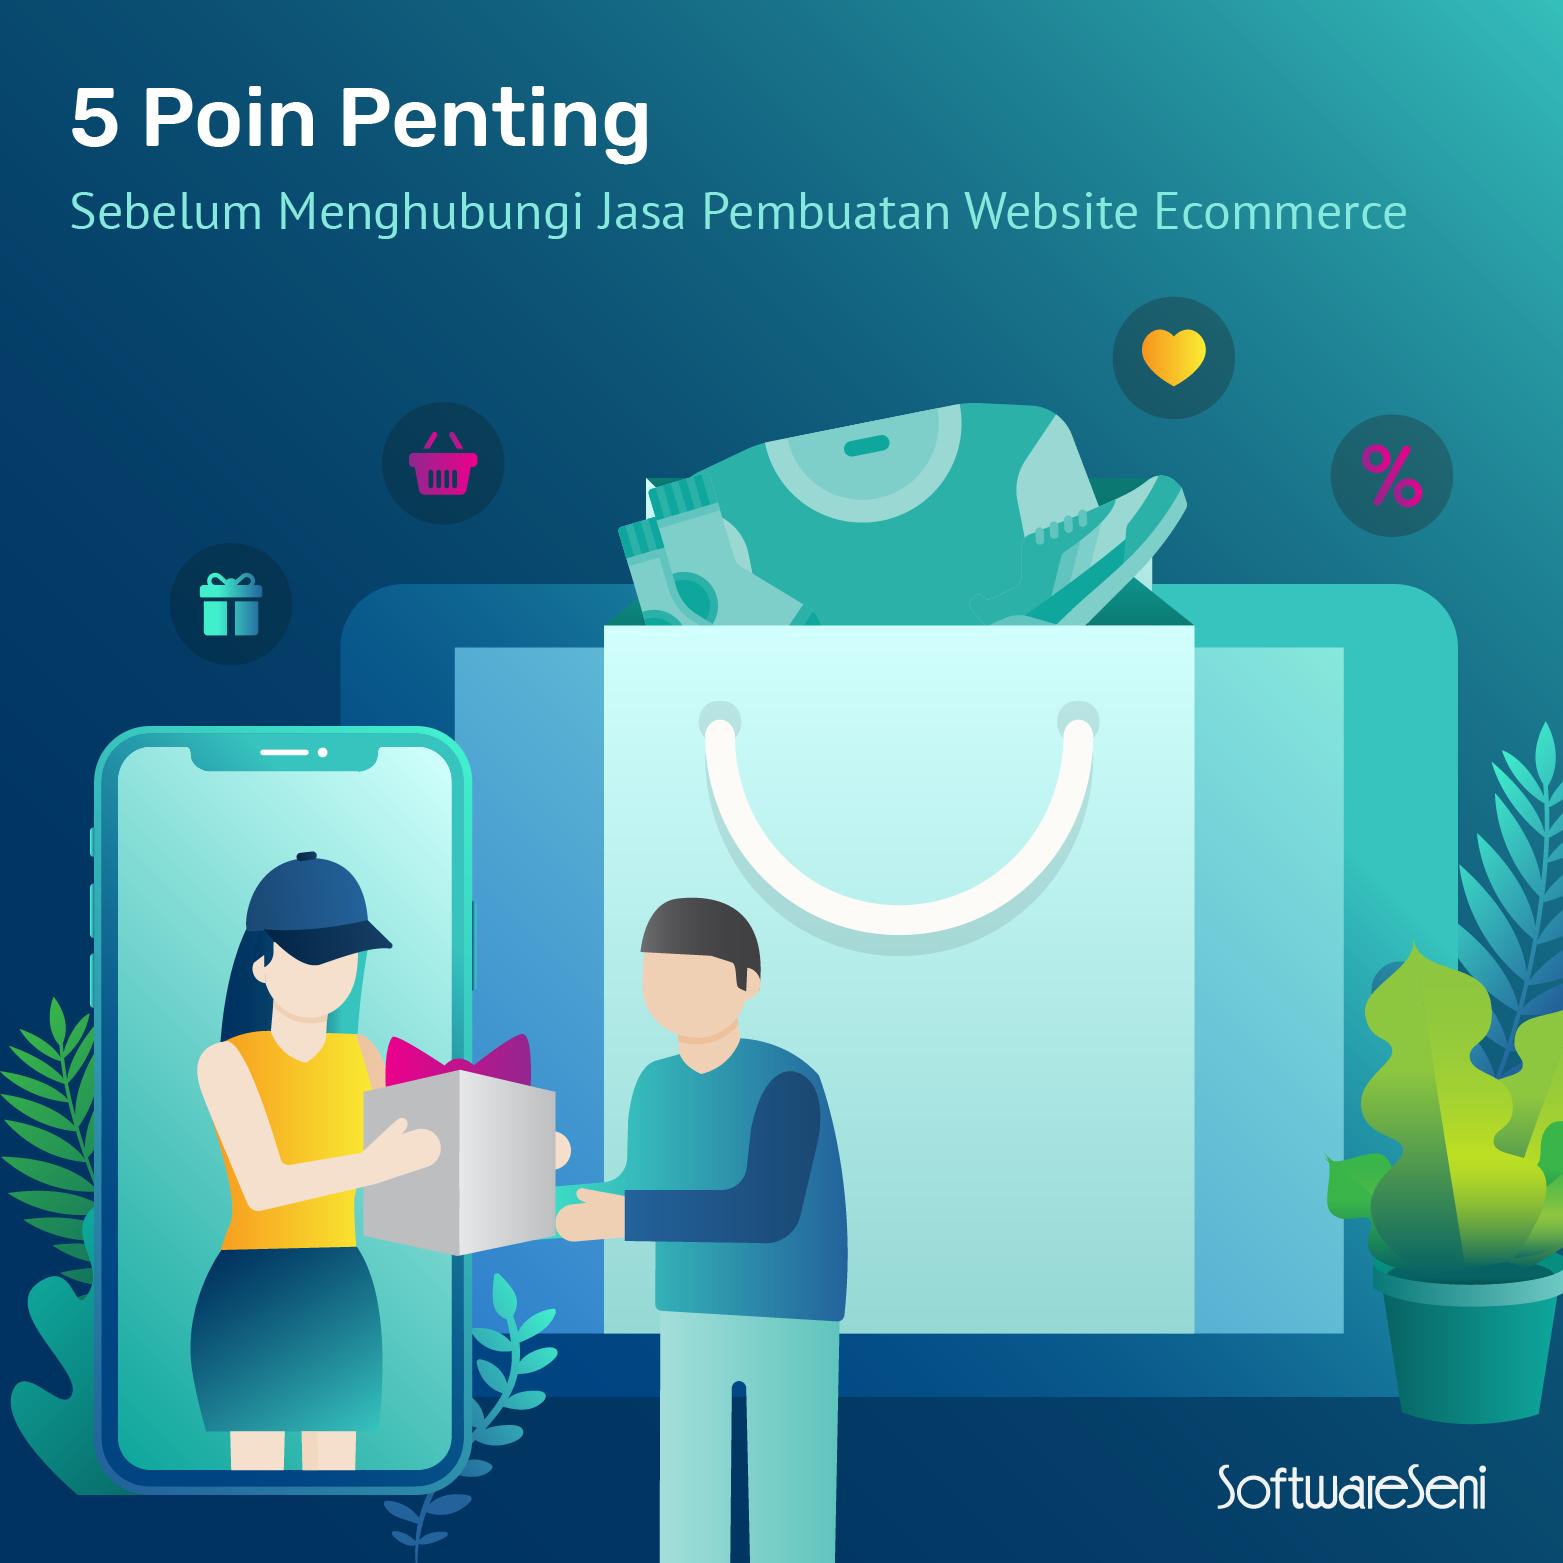 5 Poin Penting Sebelum Menghubungi Jasa Pembuatan Website Ecommerce